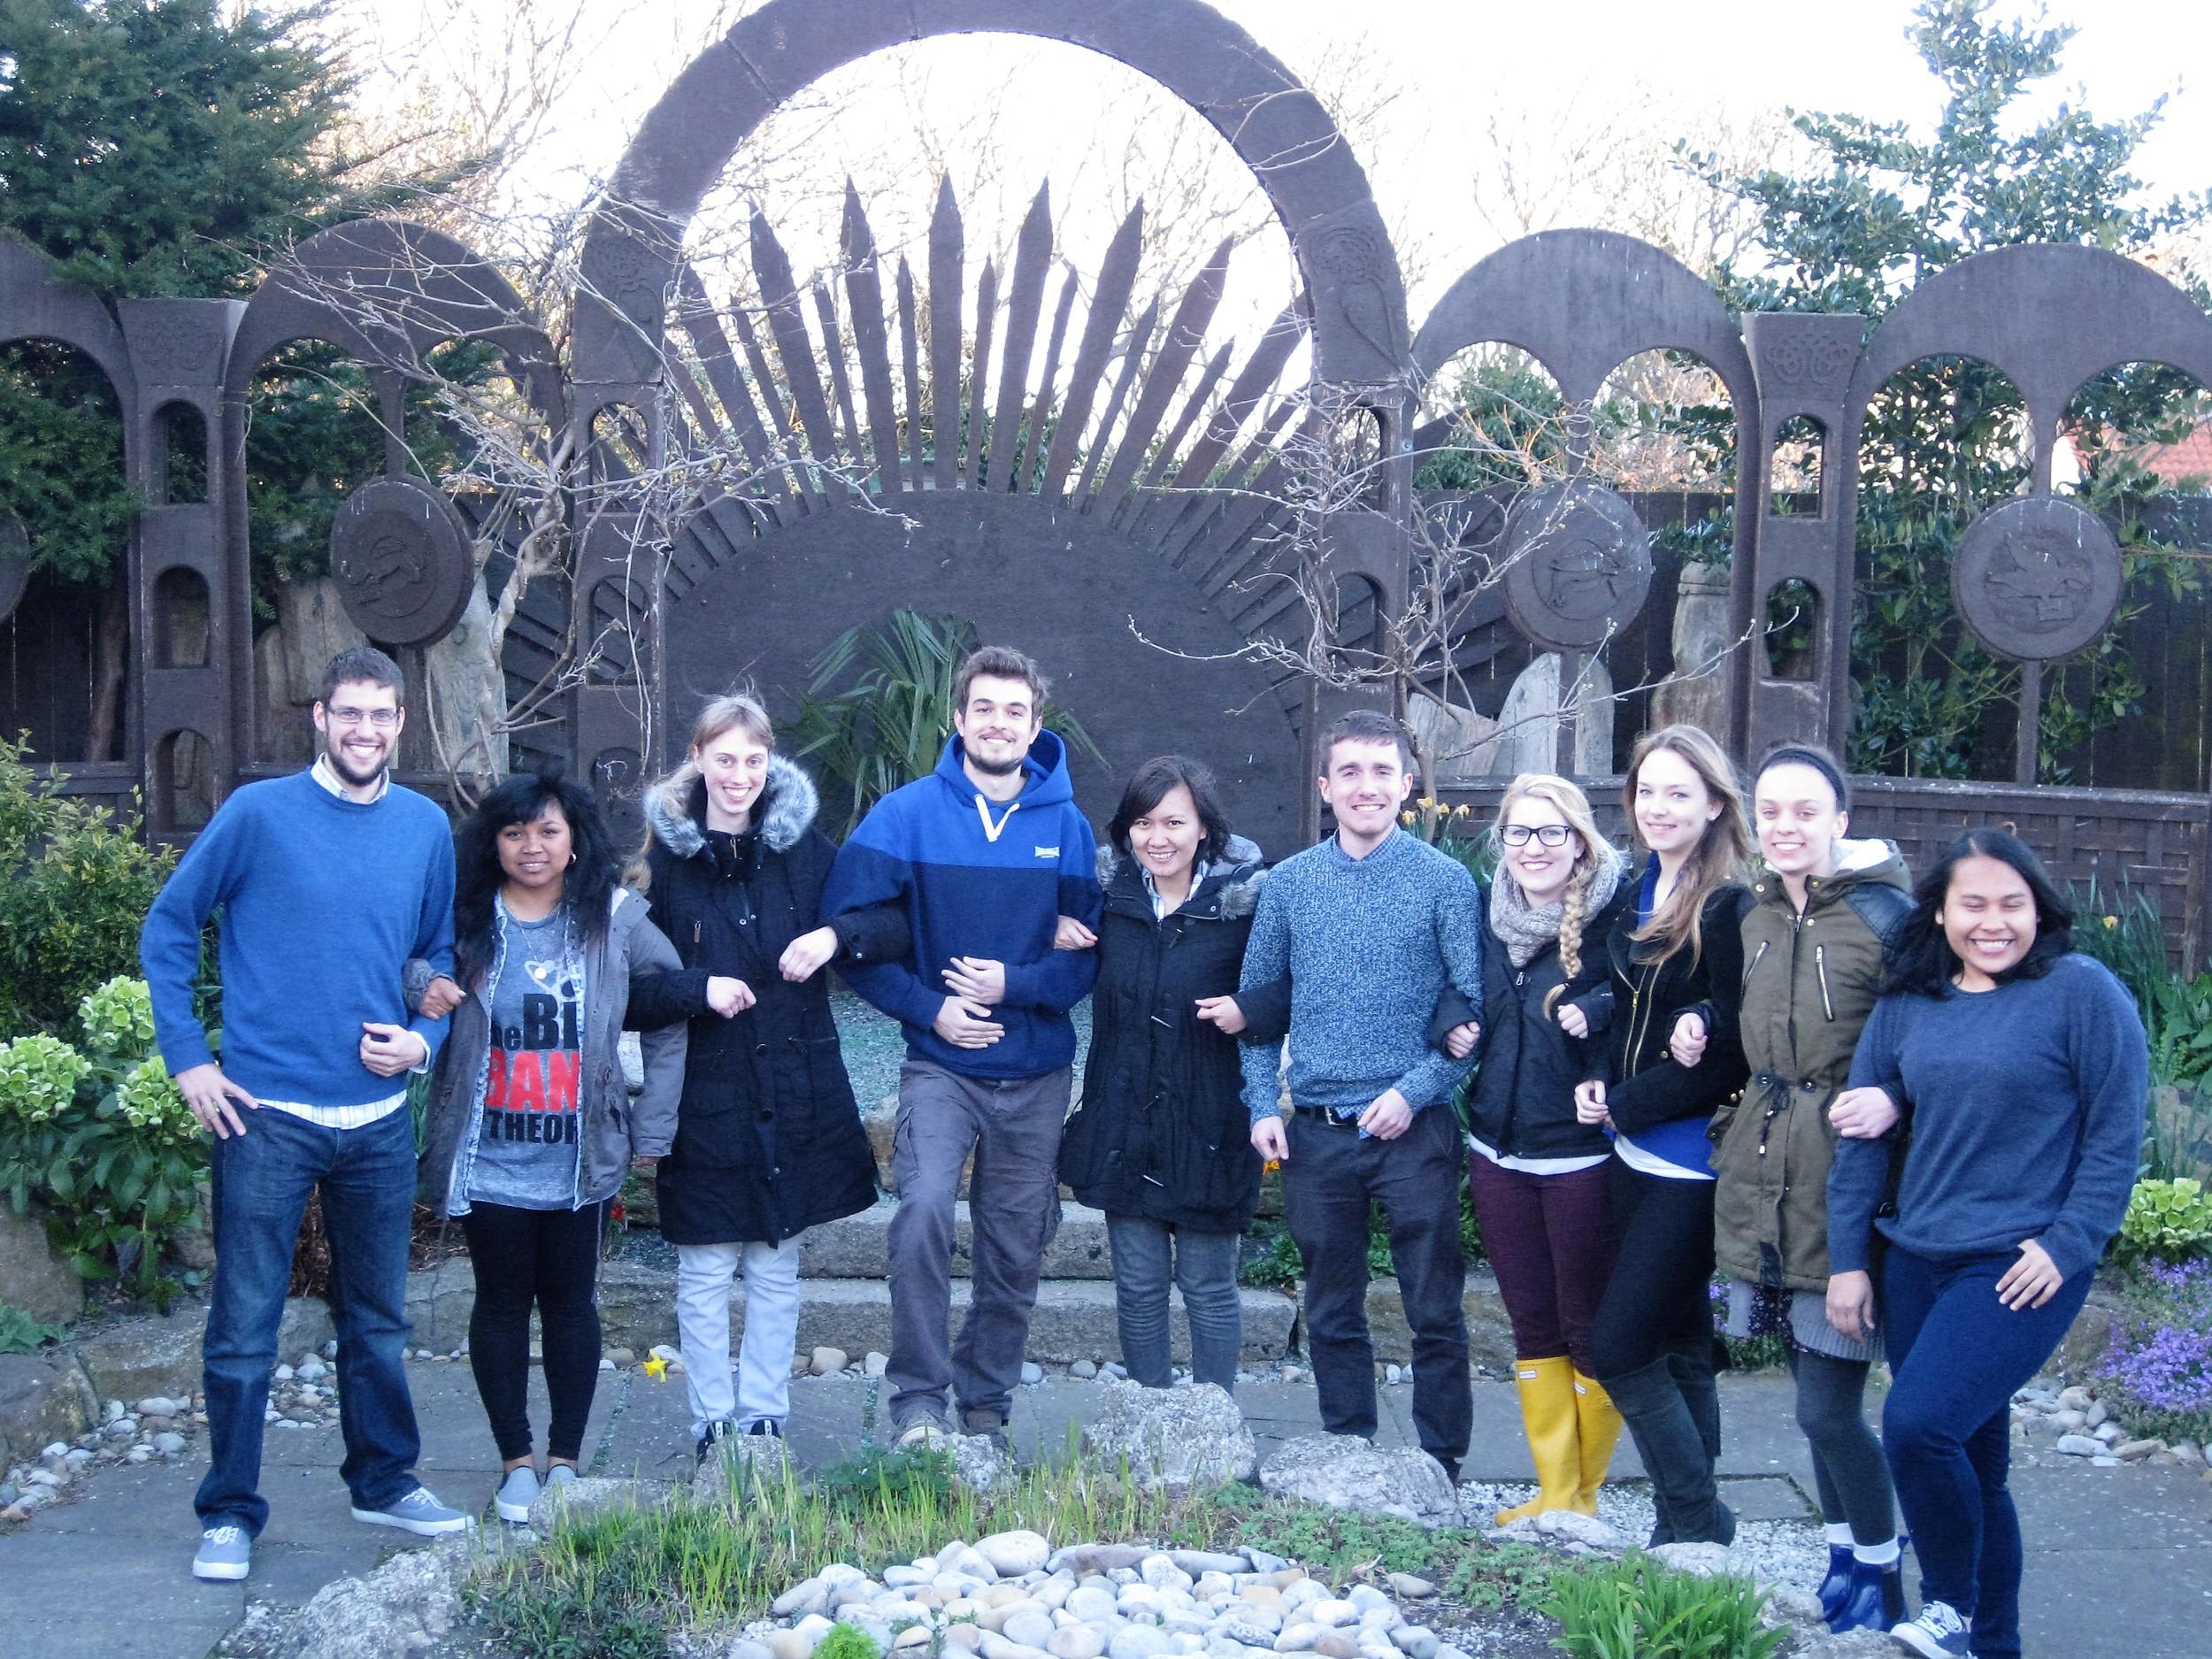 Left to right: Paul (England), Vonin (Madagascar), Julia (Germany), Matteo (Italy), Aselia (Indonesia), Paul (Ireland), Amelia (USA), Franzi (Germany), Maggie (USA), Devita (Indonesia)